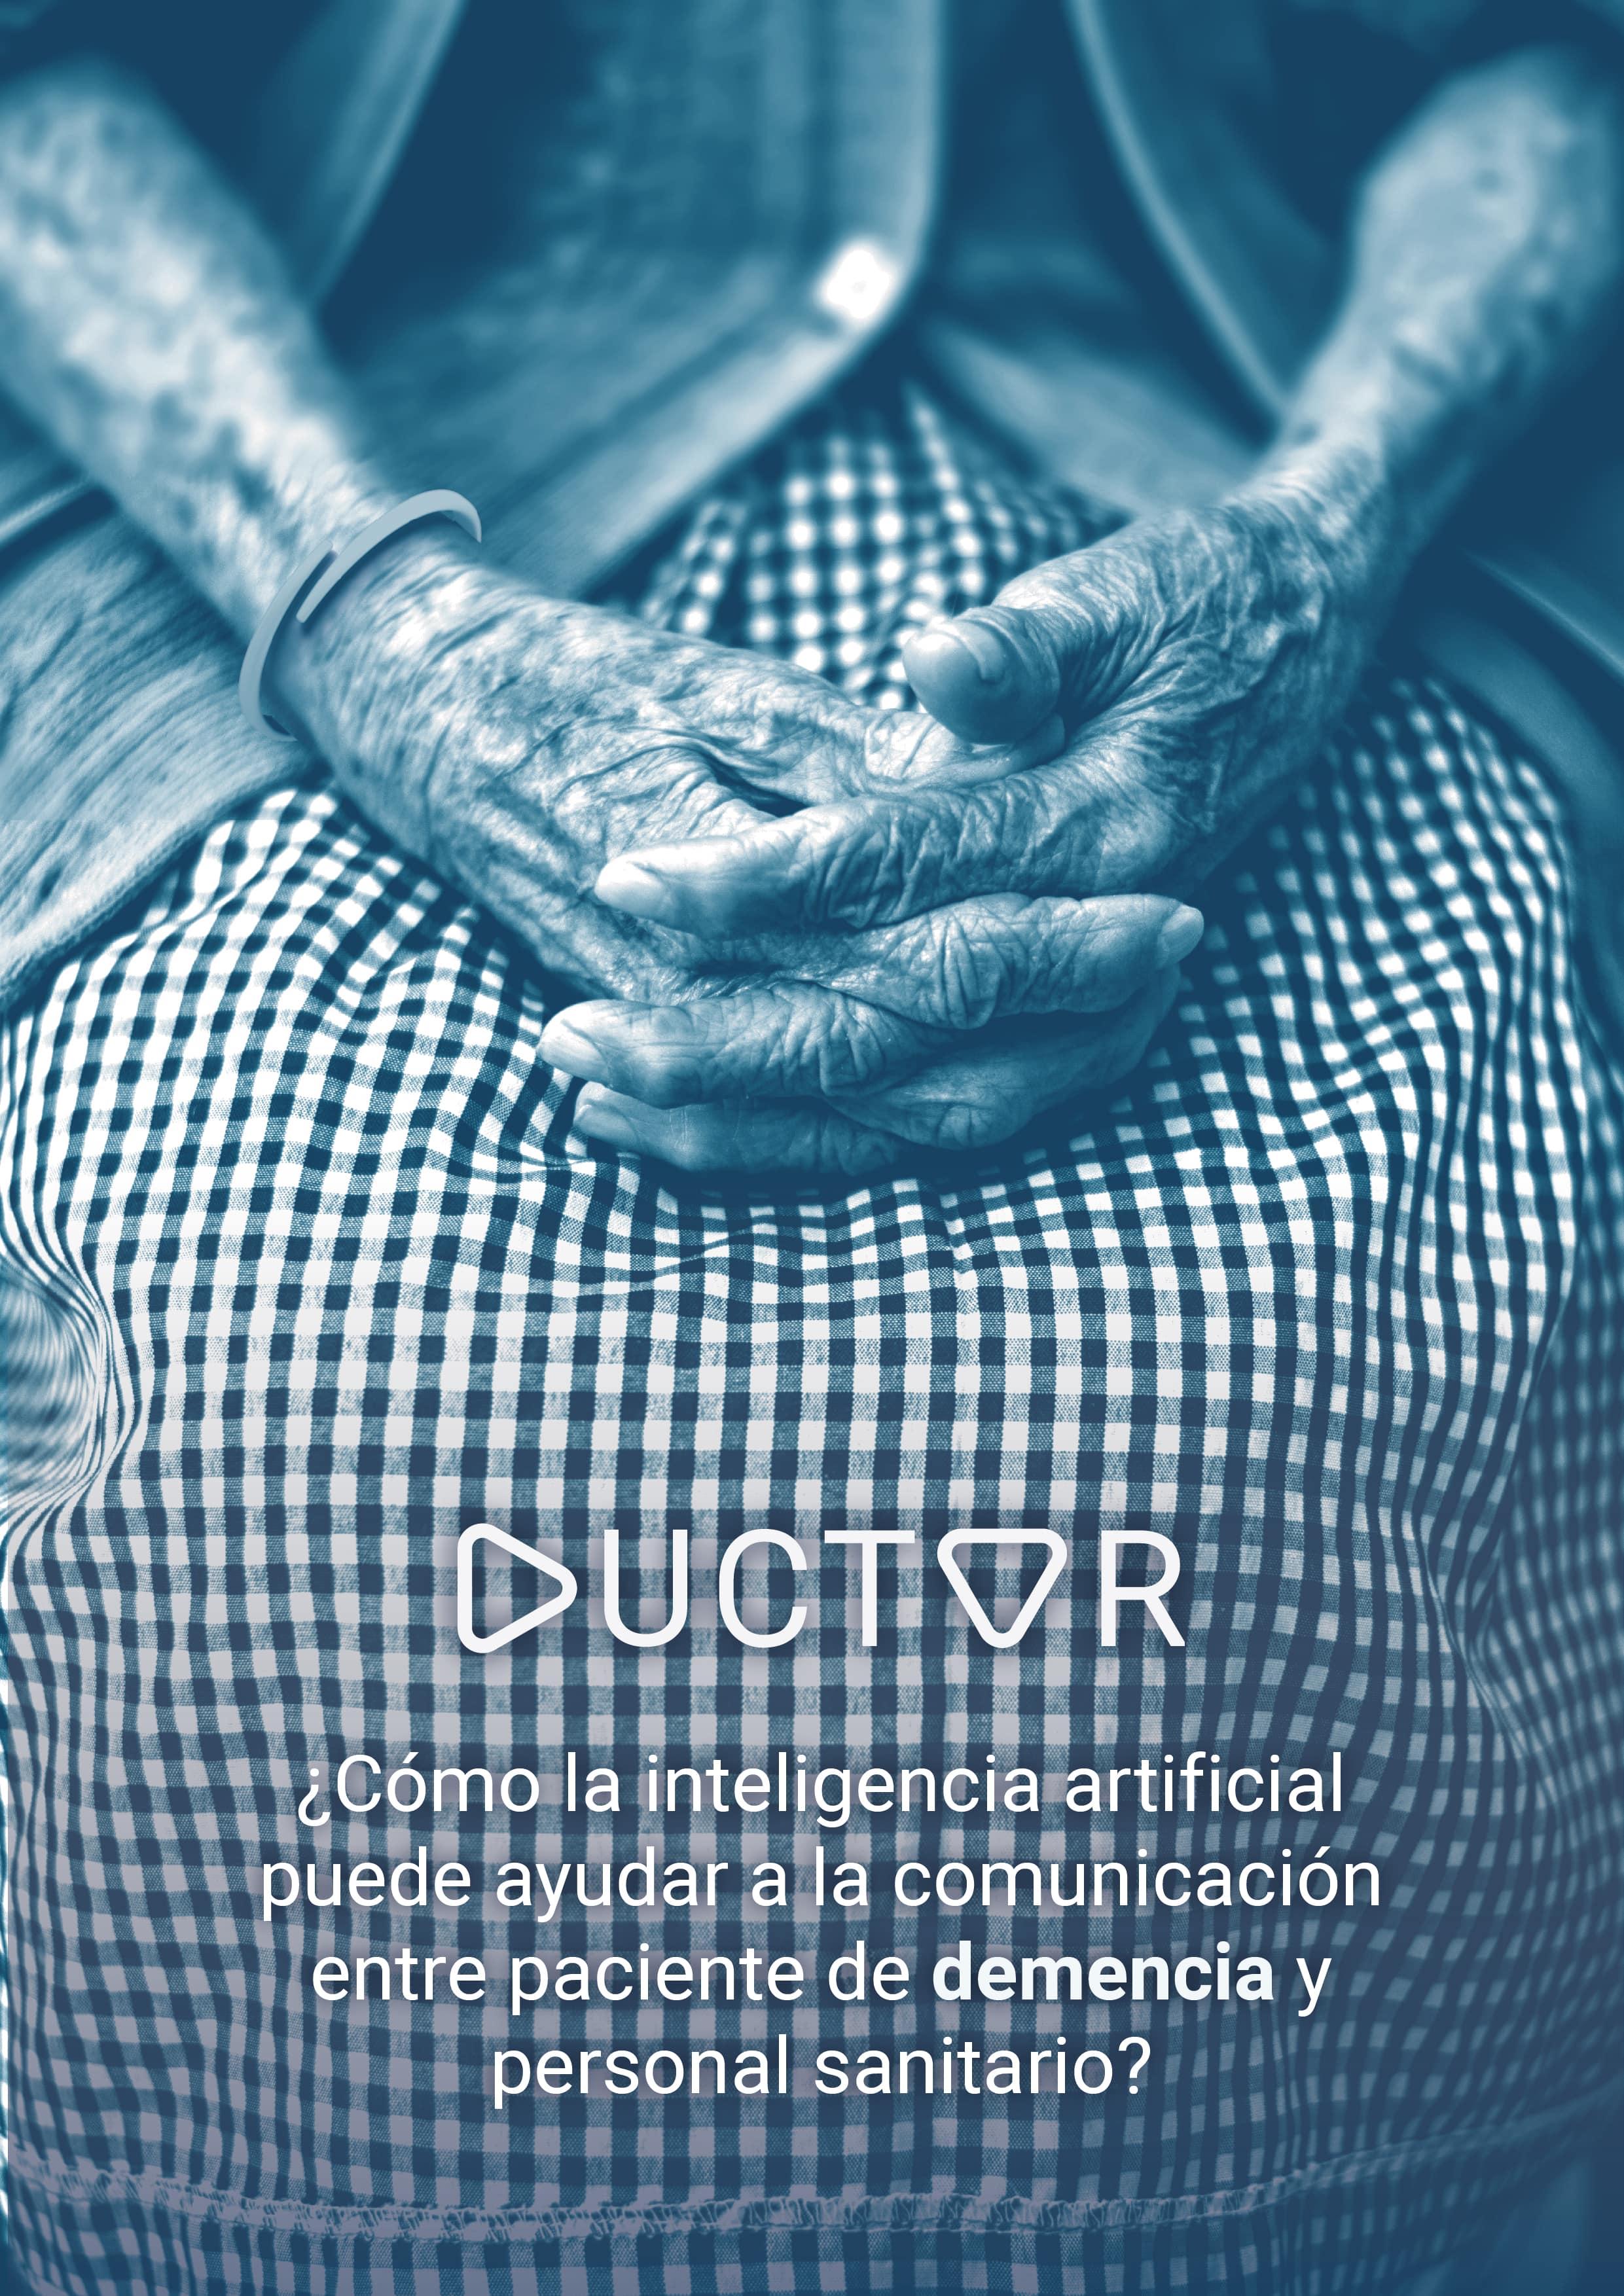 DUCTOR  by patricia trincado garbayo - Creative Work - $i